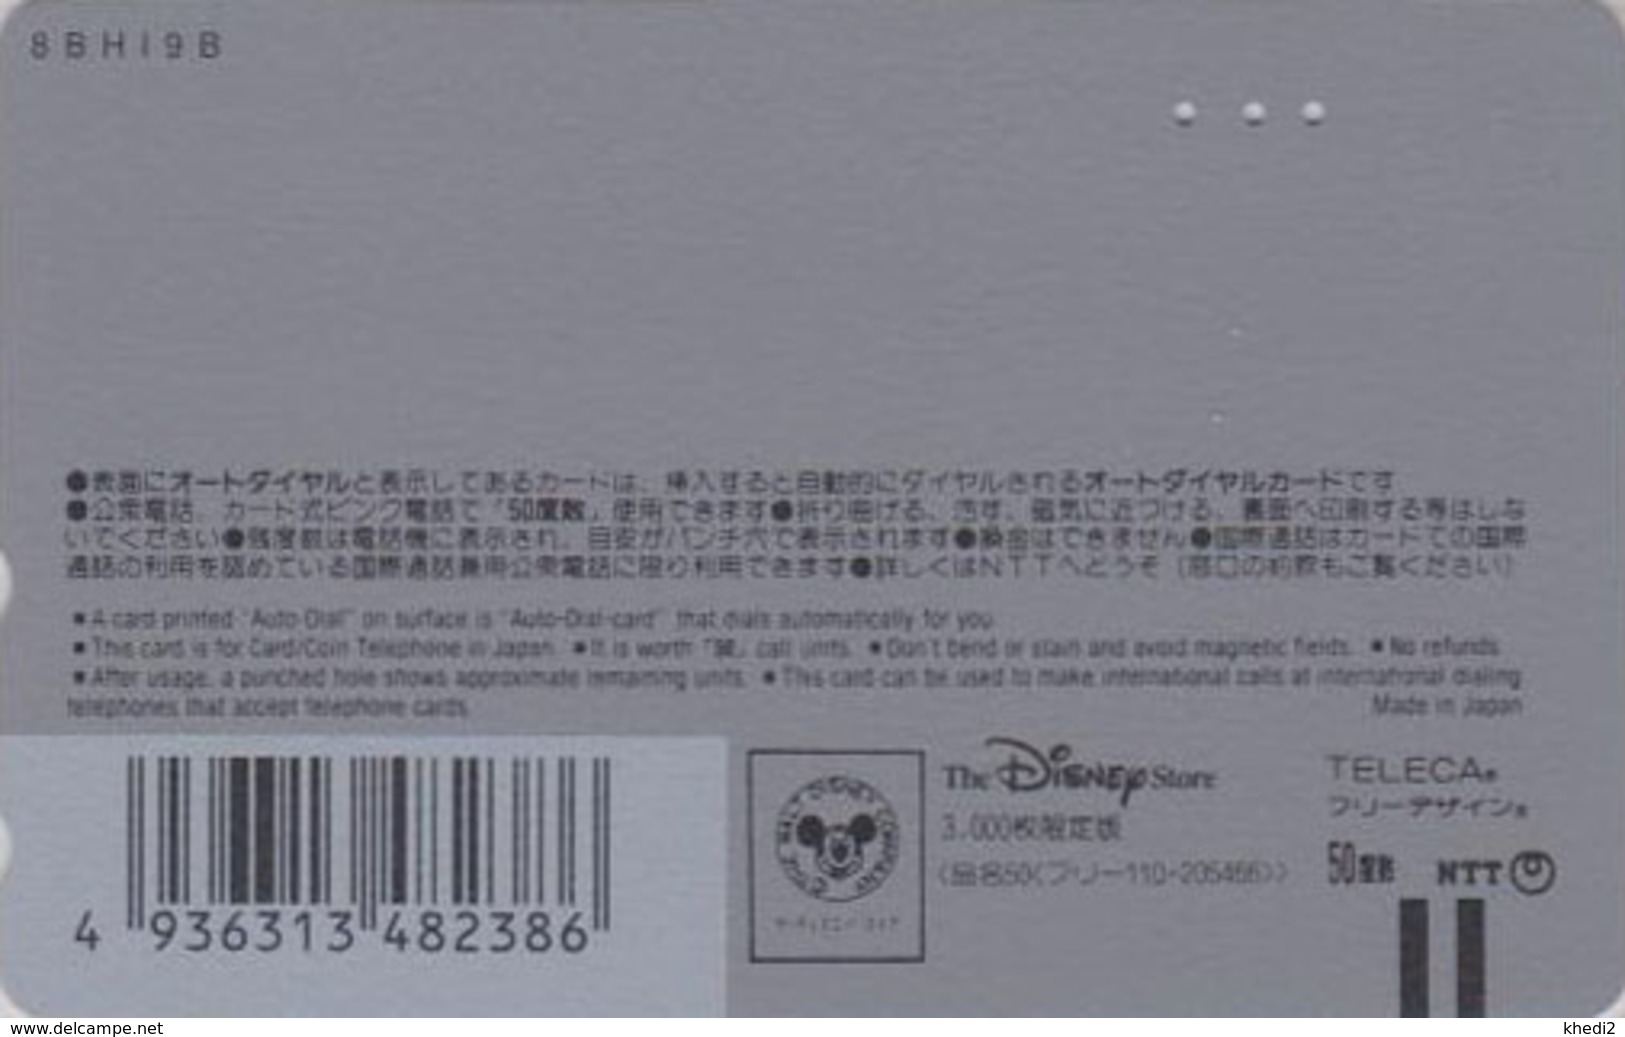 Télécarte Japon / 110-205466 - DISNEY STORE GO - MICKEY MINNIE DONALD MT FUJI - HIEZU 1999 - Japan Phonecard / 3000 EX - Disney